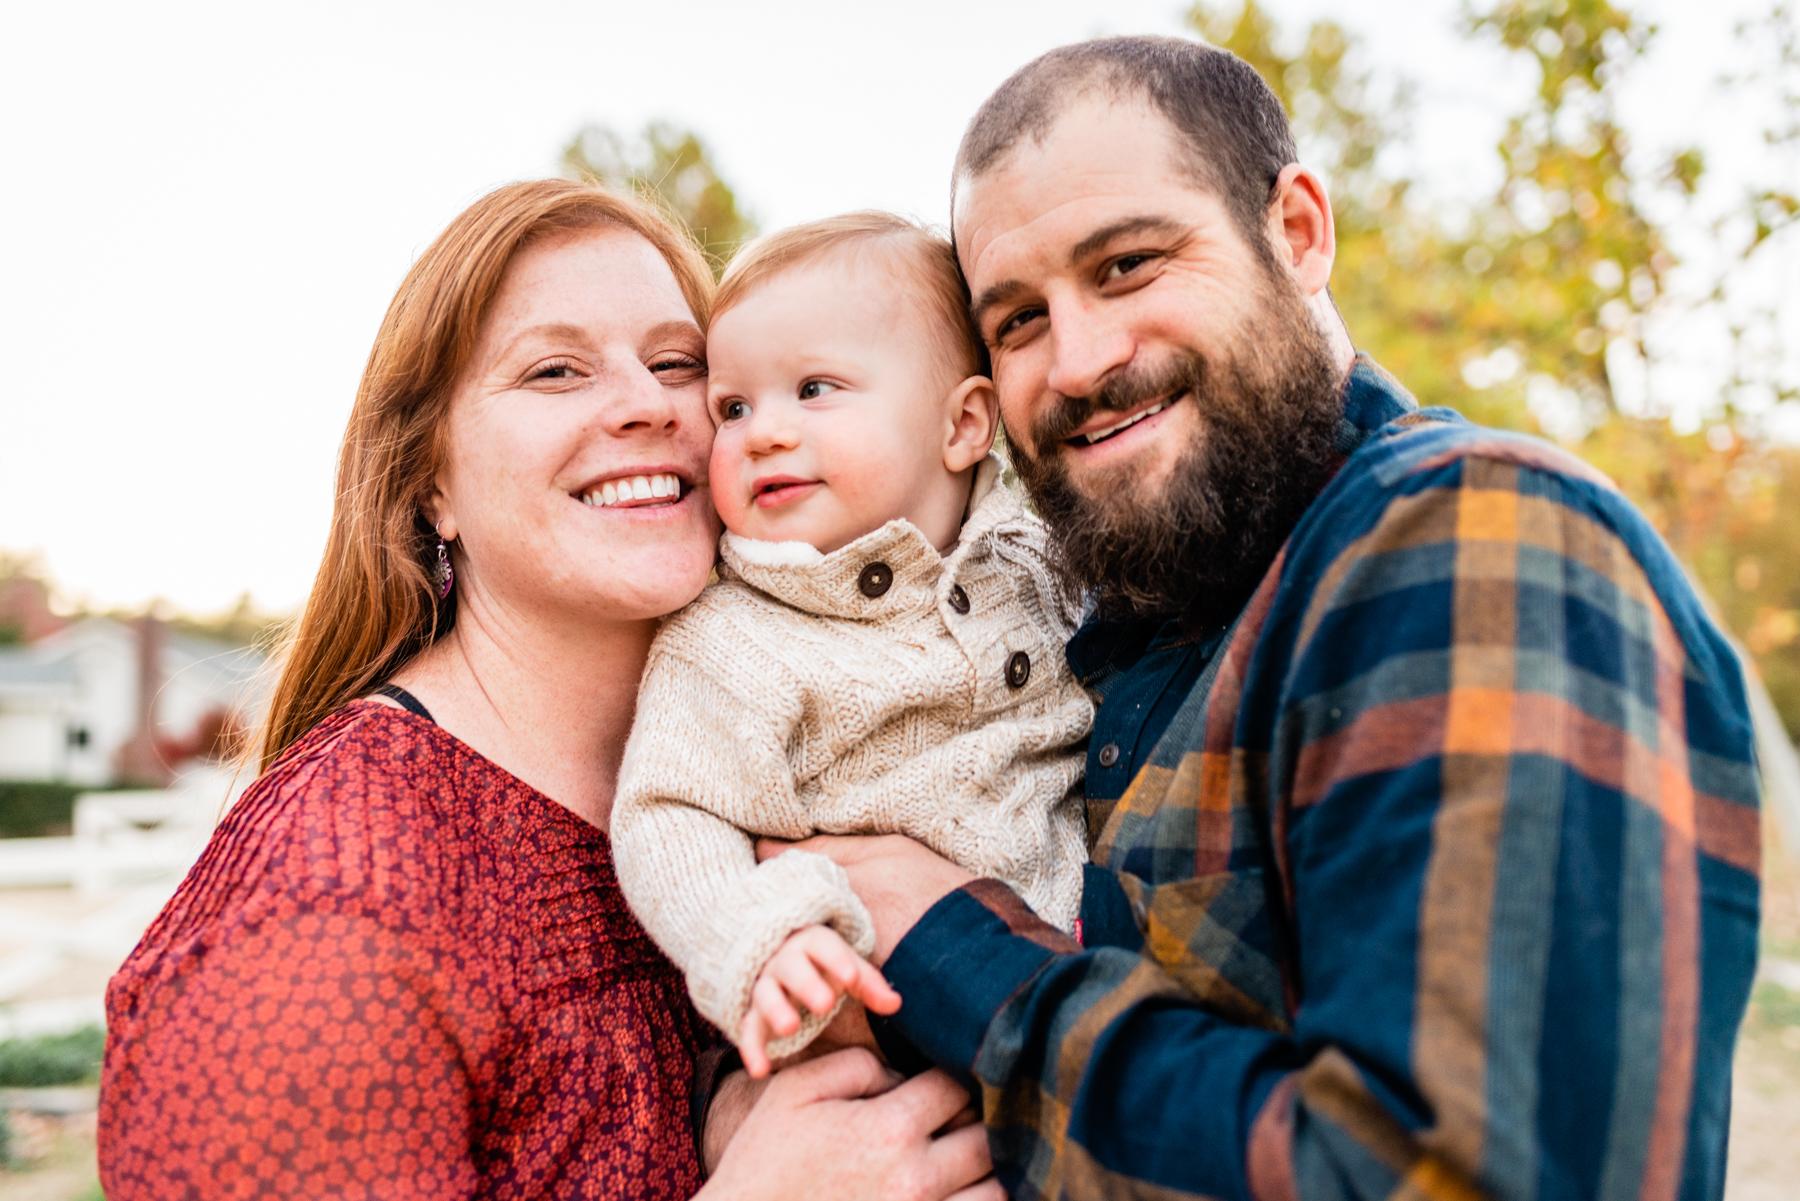 Family portrait at Hap Magee Park.